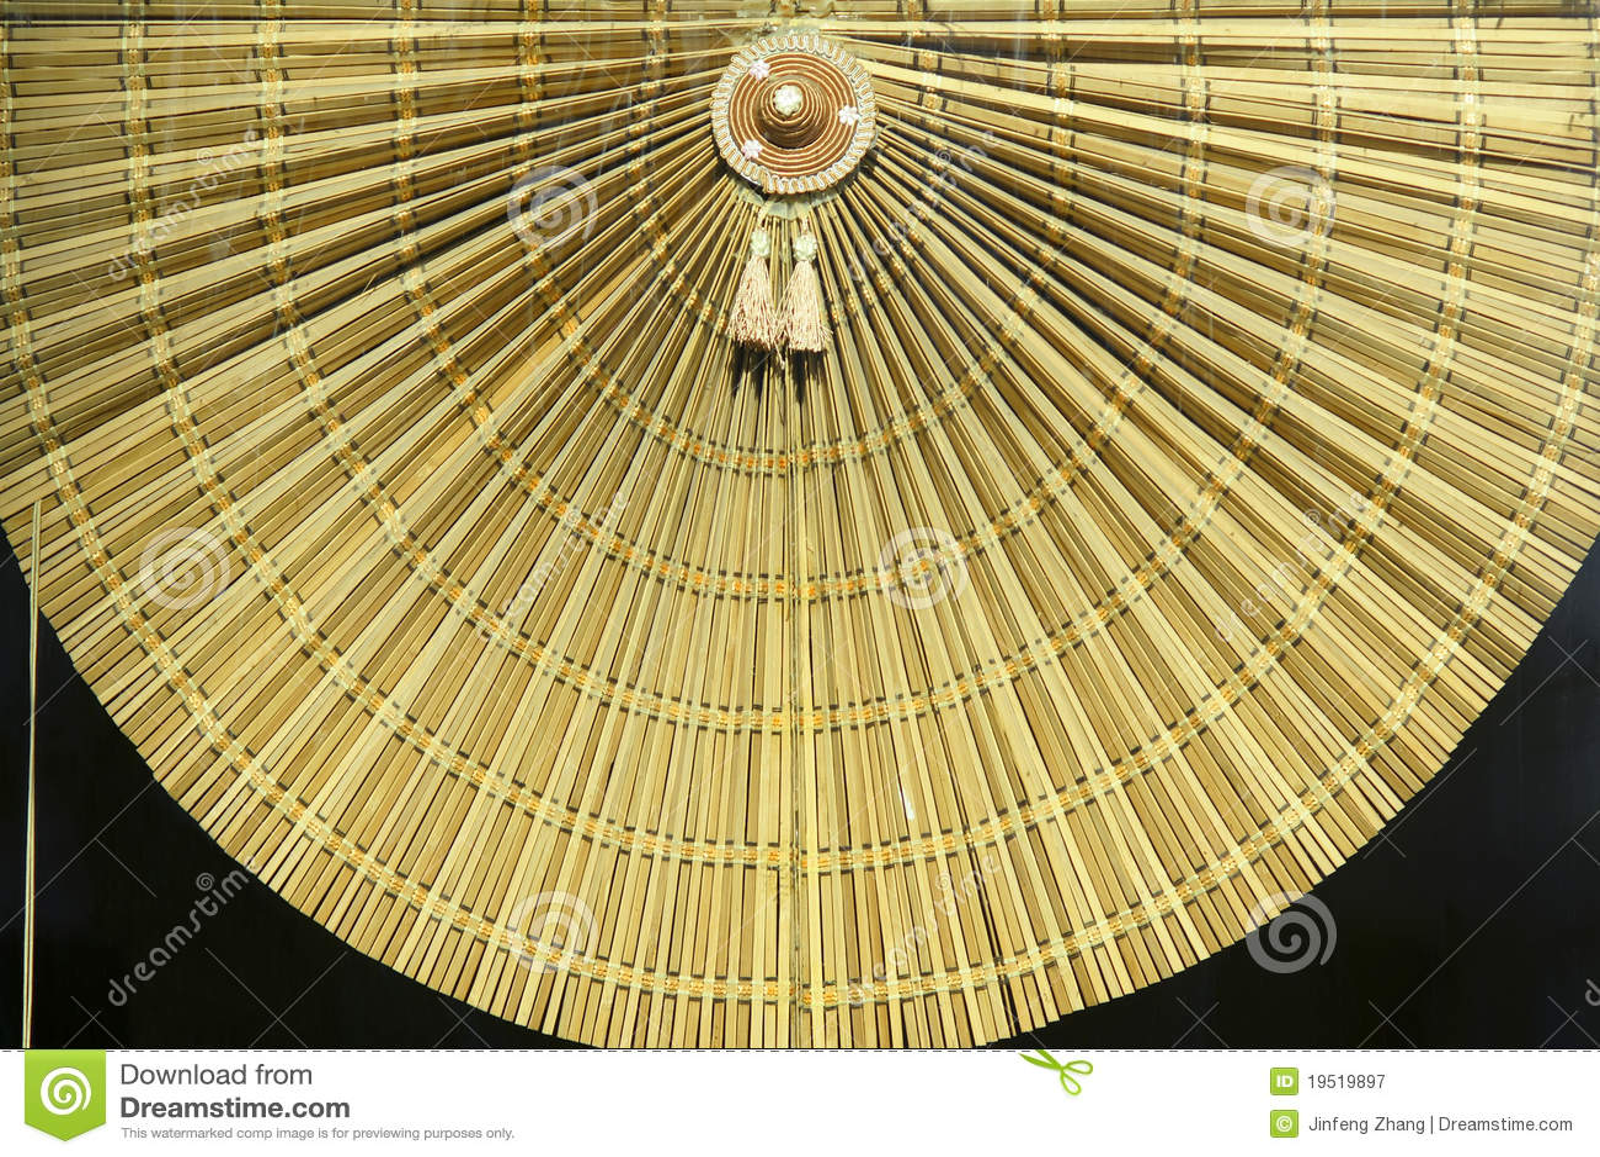 Cortina de bambu fotografia de stock royalty free imagem - Cortina de bambu ...